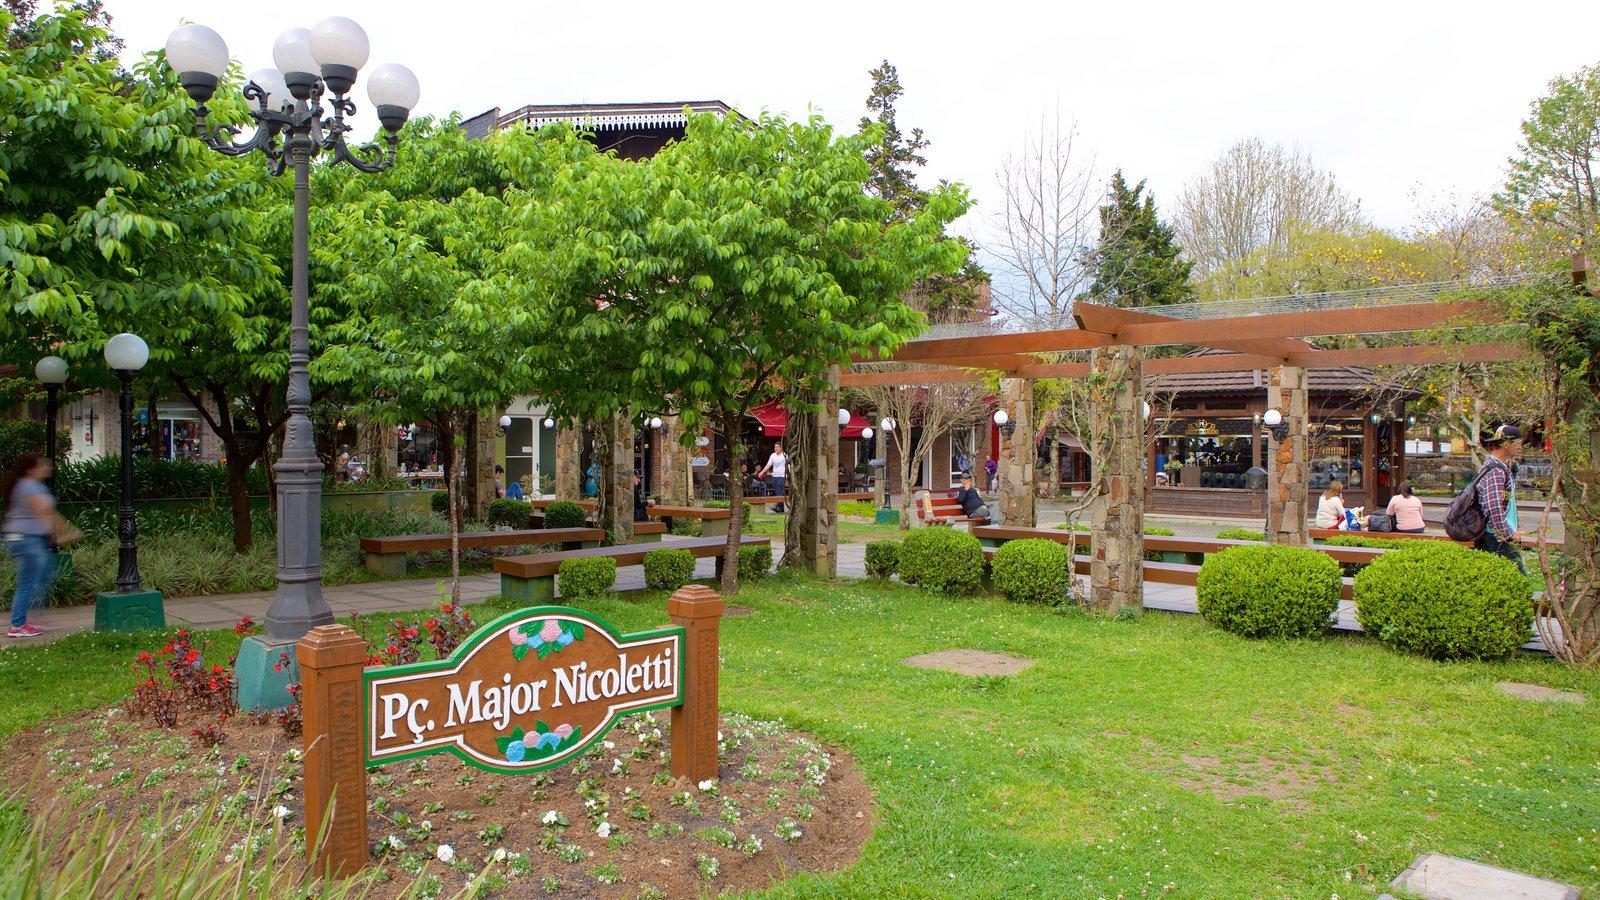 Praça Major Nicoletti que inclui um parque